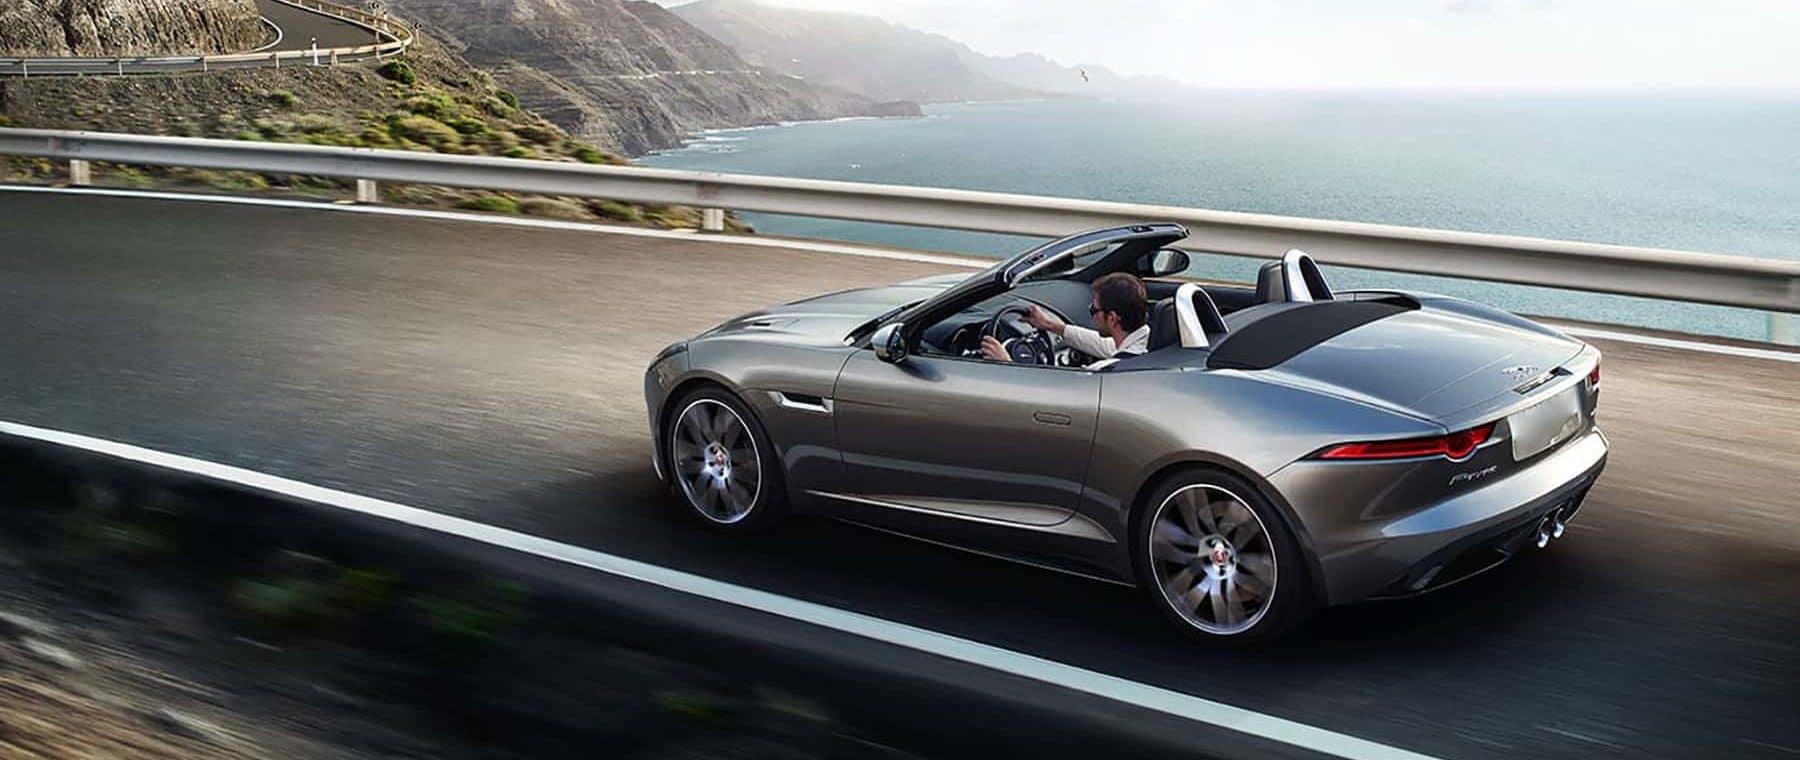 Jaguar Flatirons Jaguar Dealer In Broomfield Co